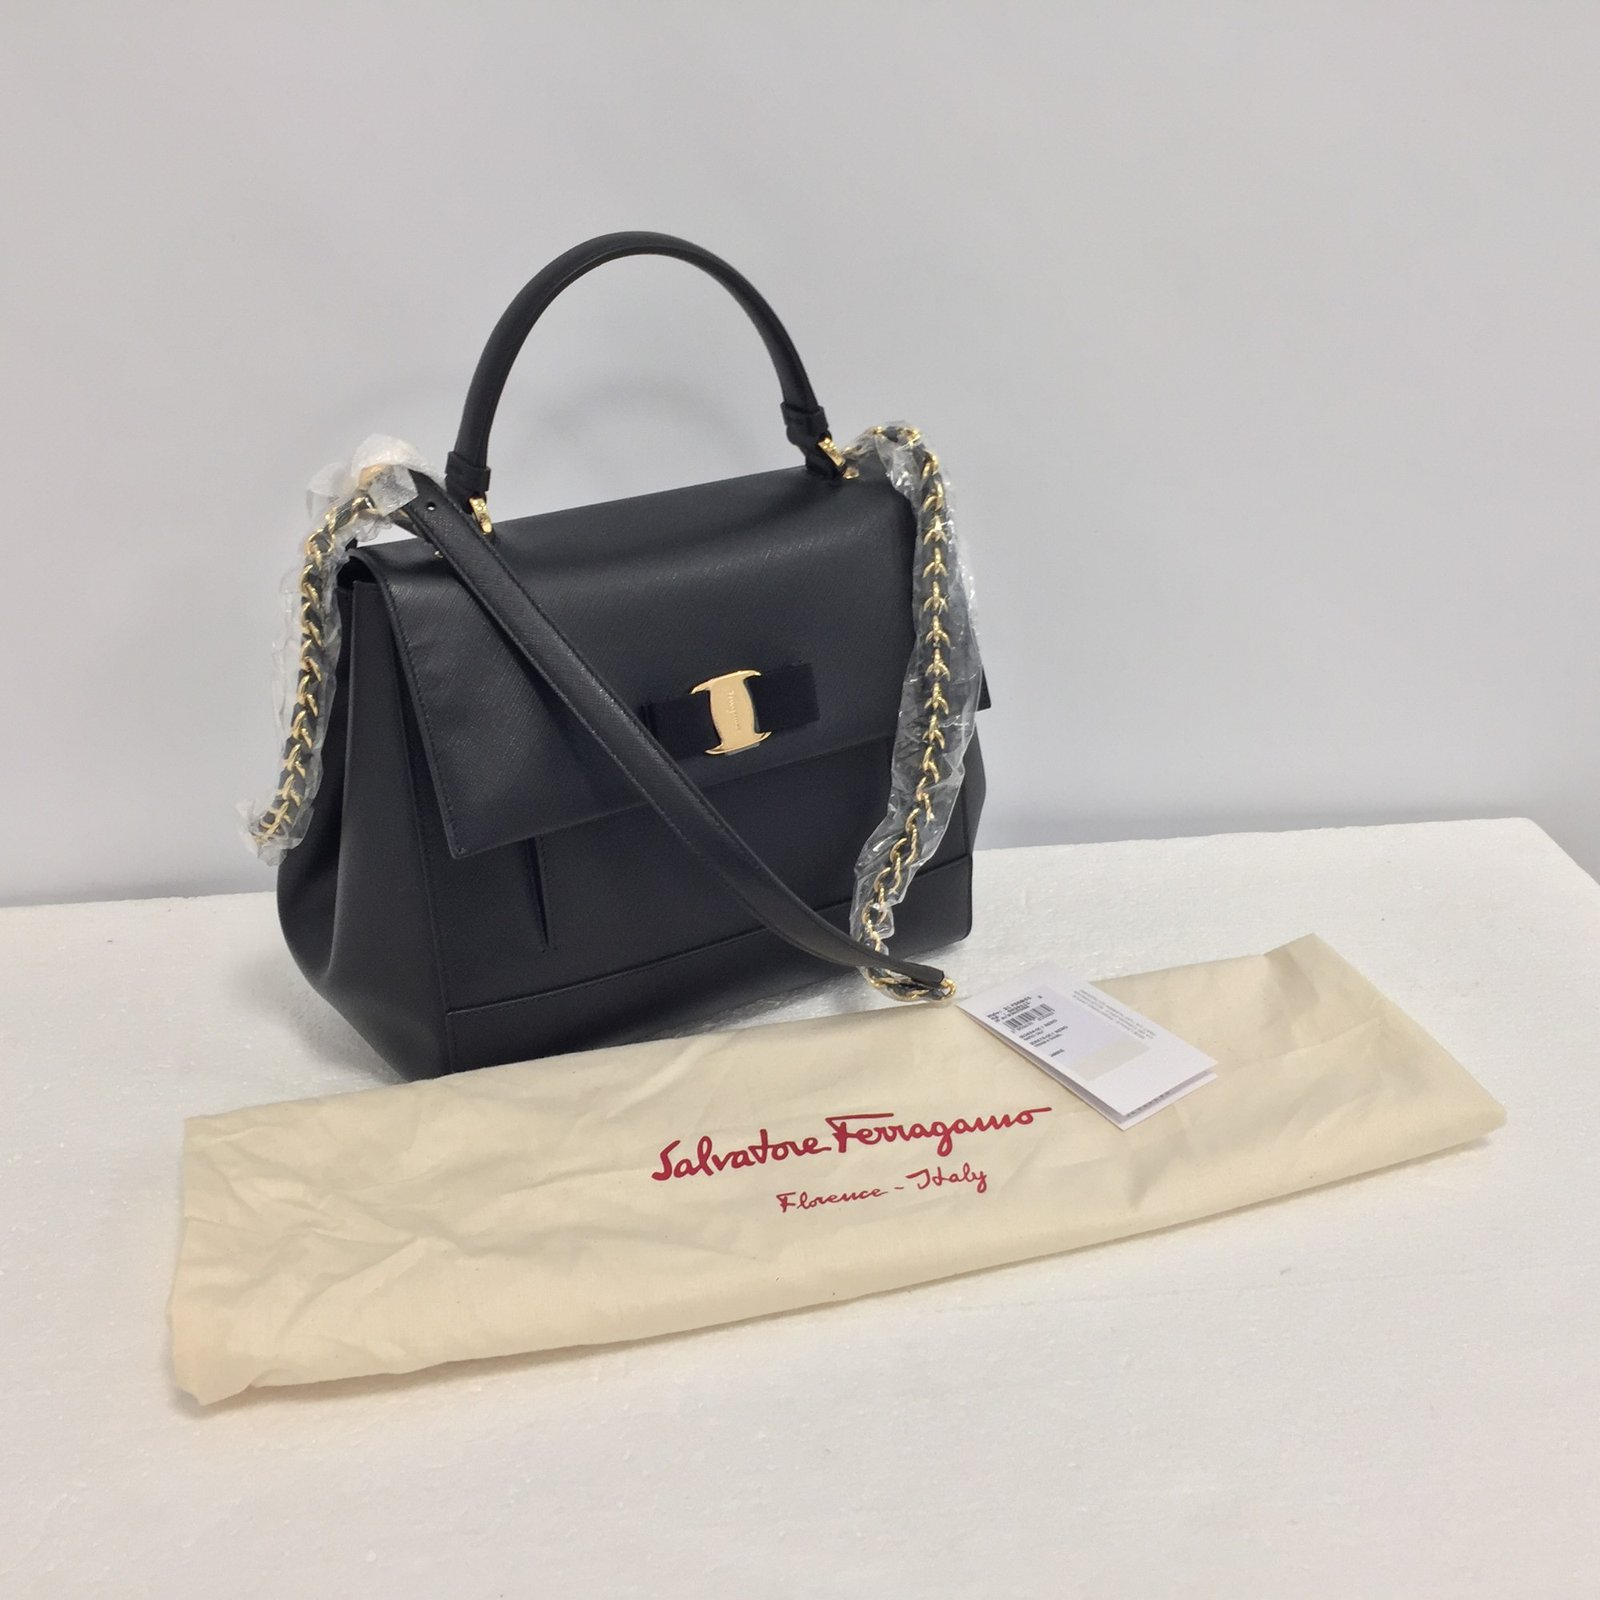 4aa281b6a7dc Salvatore Ferragamo Carrie bag Handbags Leather Black ref.69857 - Joli  Closet